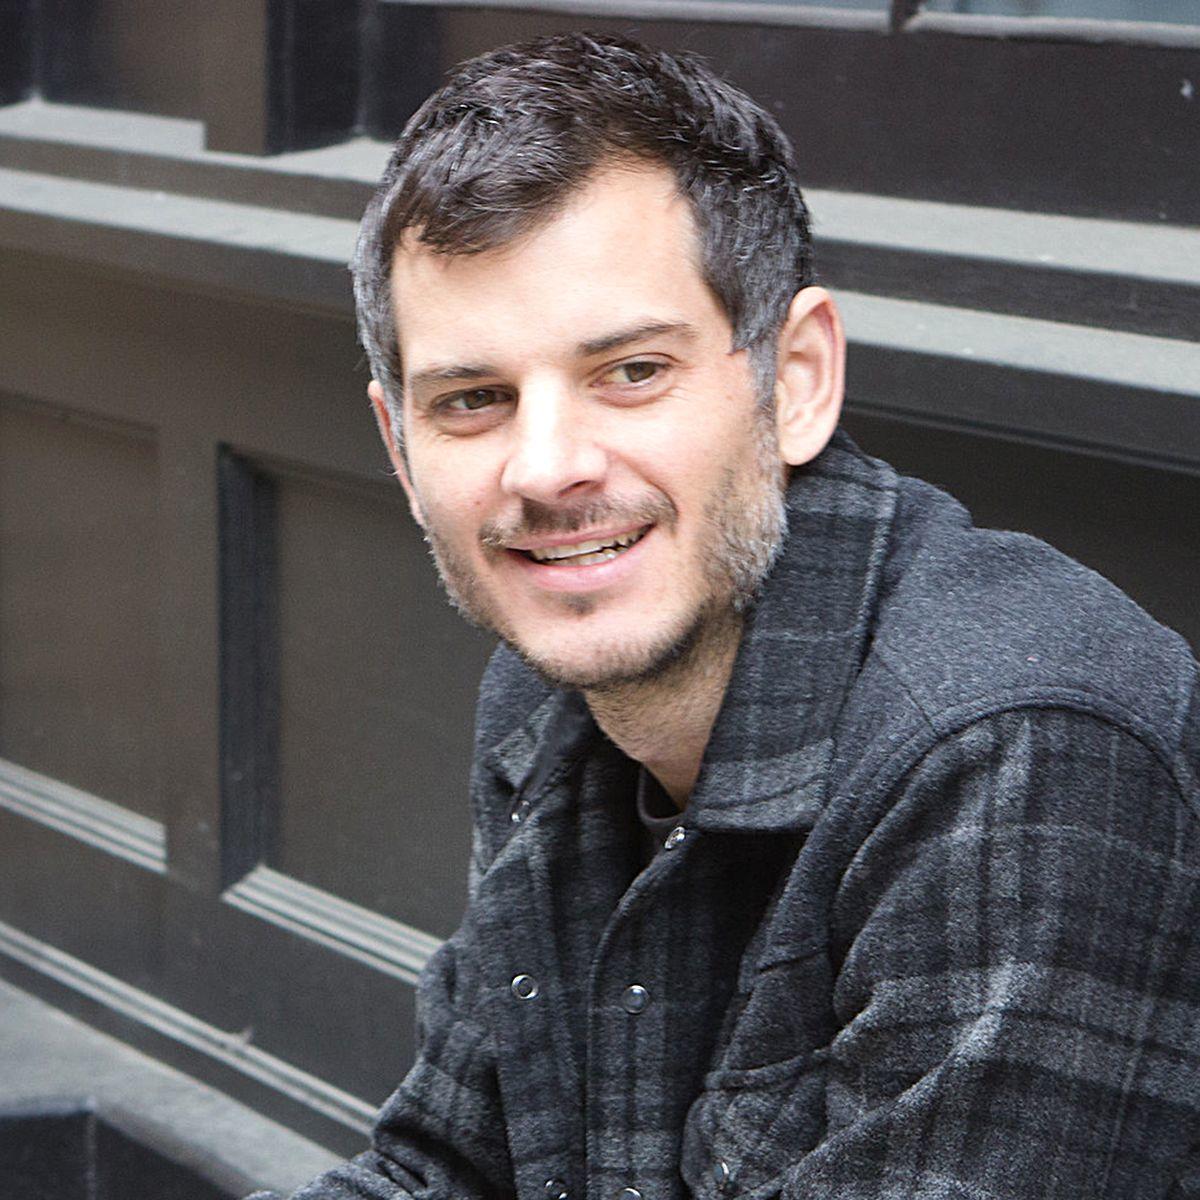 Michael Dooling